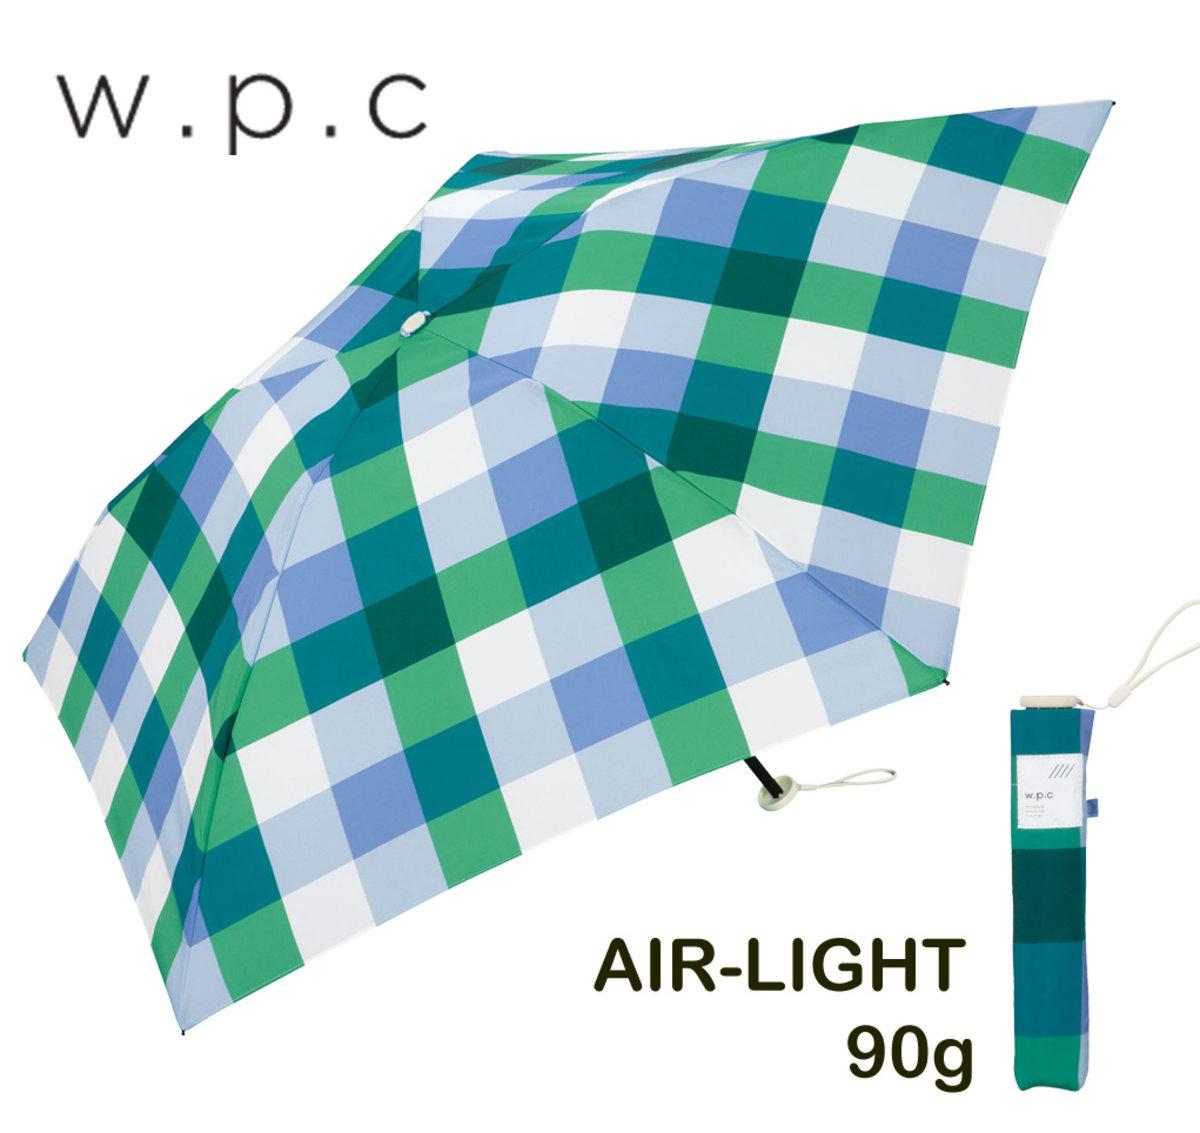 Lightweight 90gUmbrella ‧specialist from Japan - Folding Umbrella (Air-Light 90g) GR Check